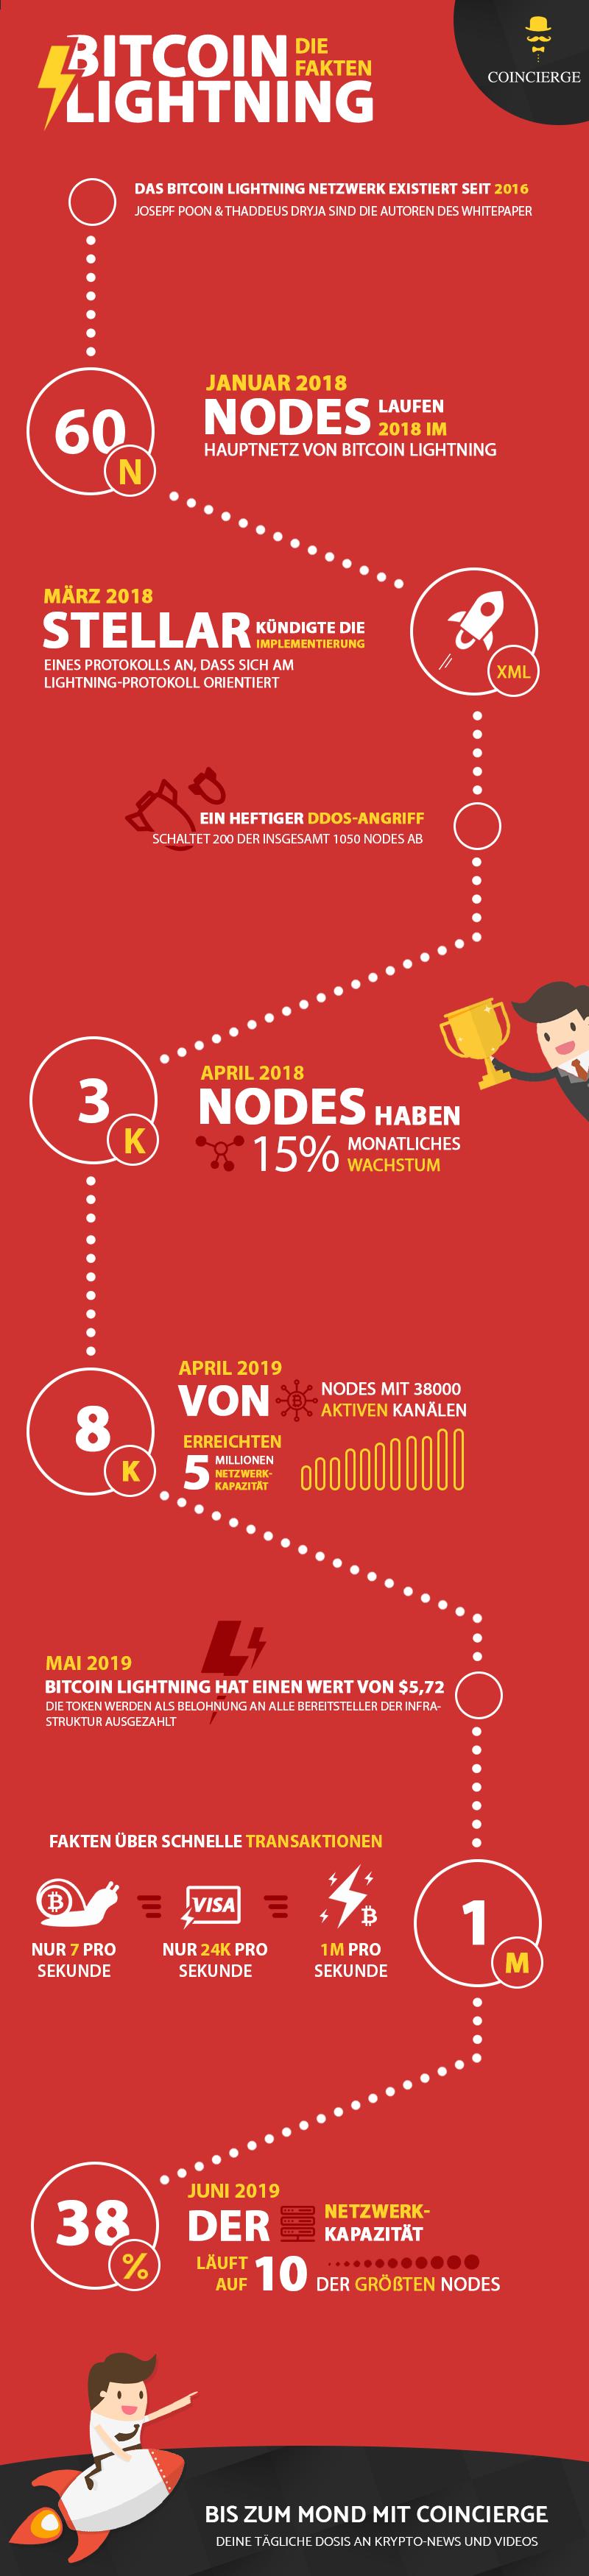 Infografik Bitcoin Lightning Netzwerk